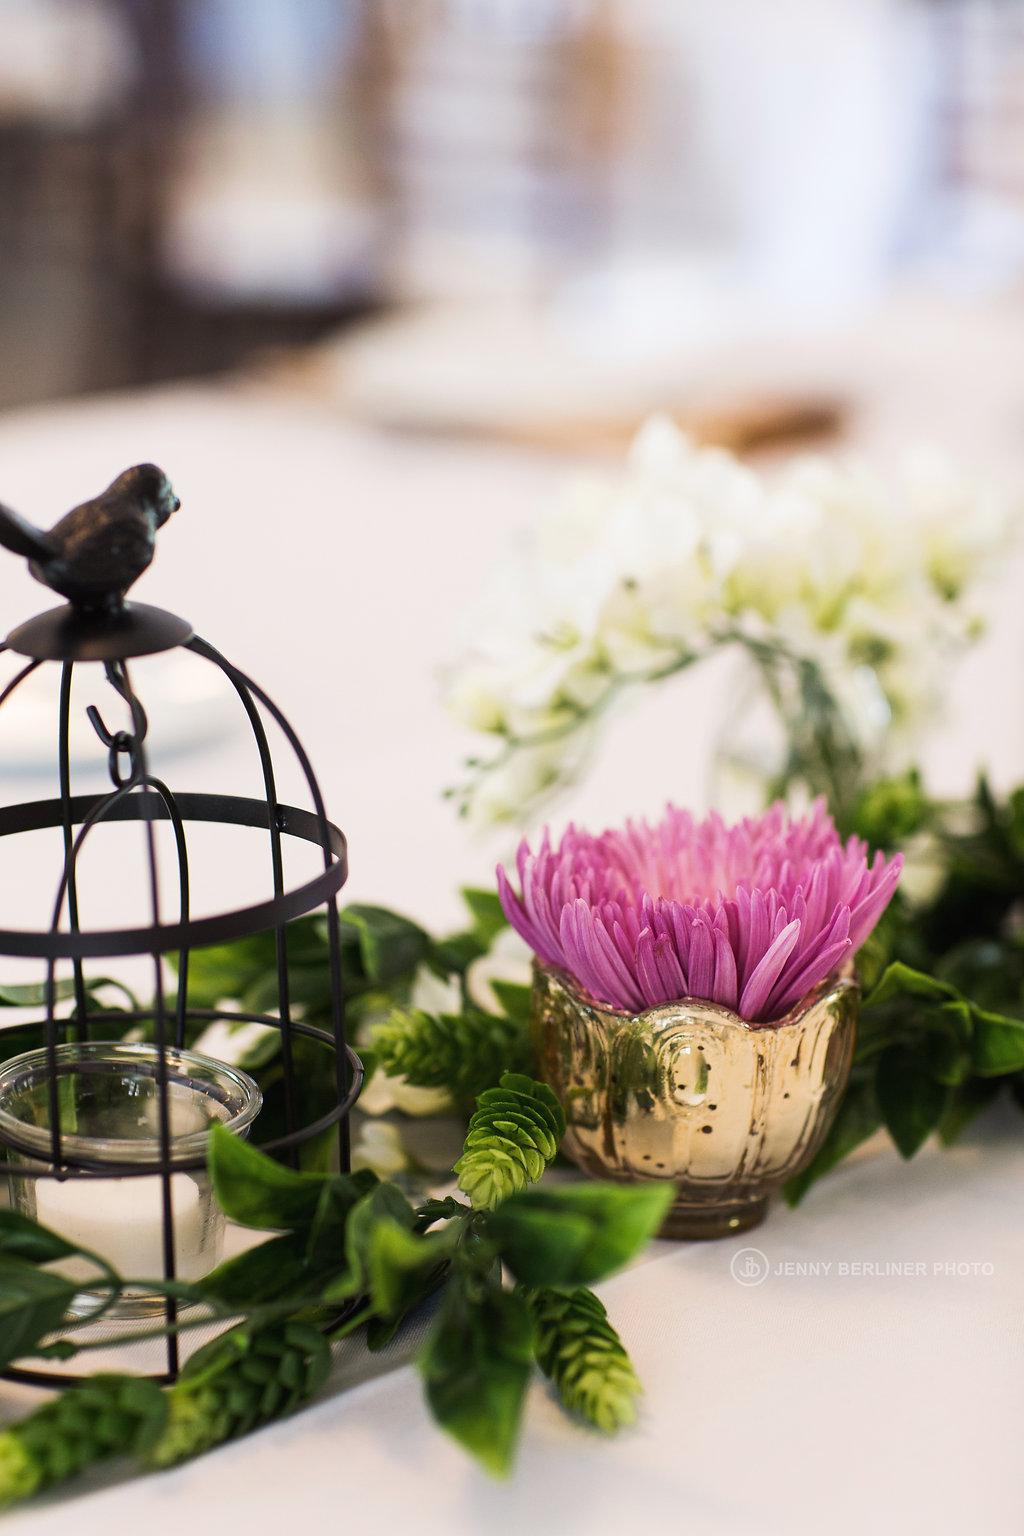 Rochester New York Wedding planner